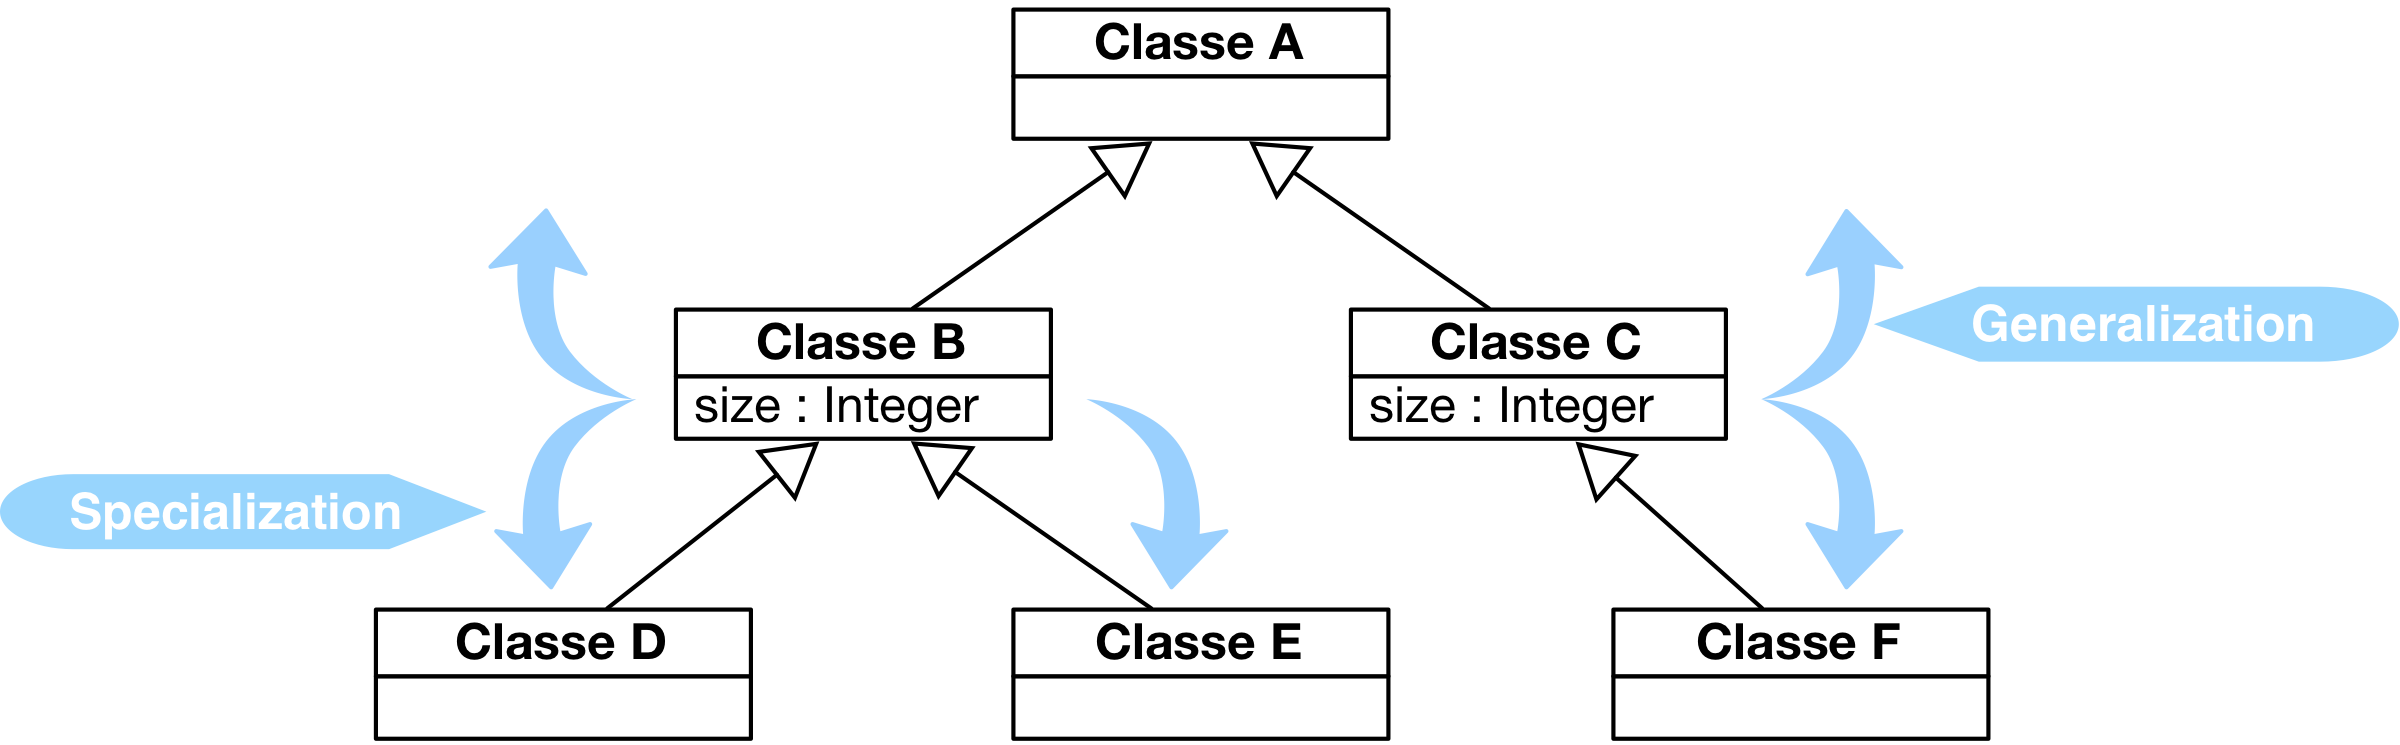 src/images/attribute-generalization.png